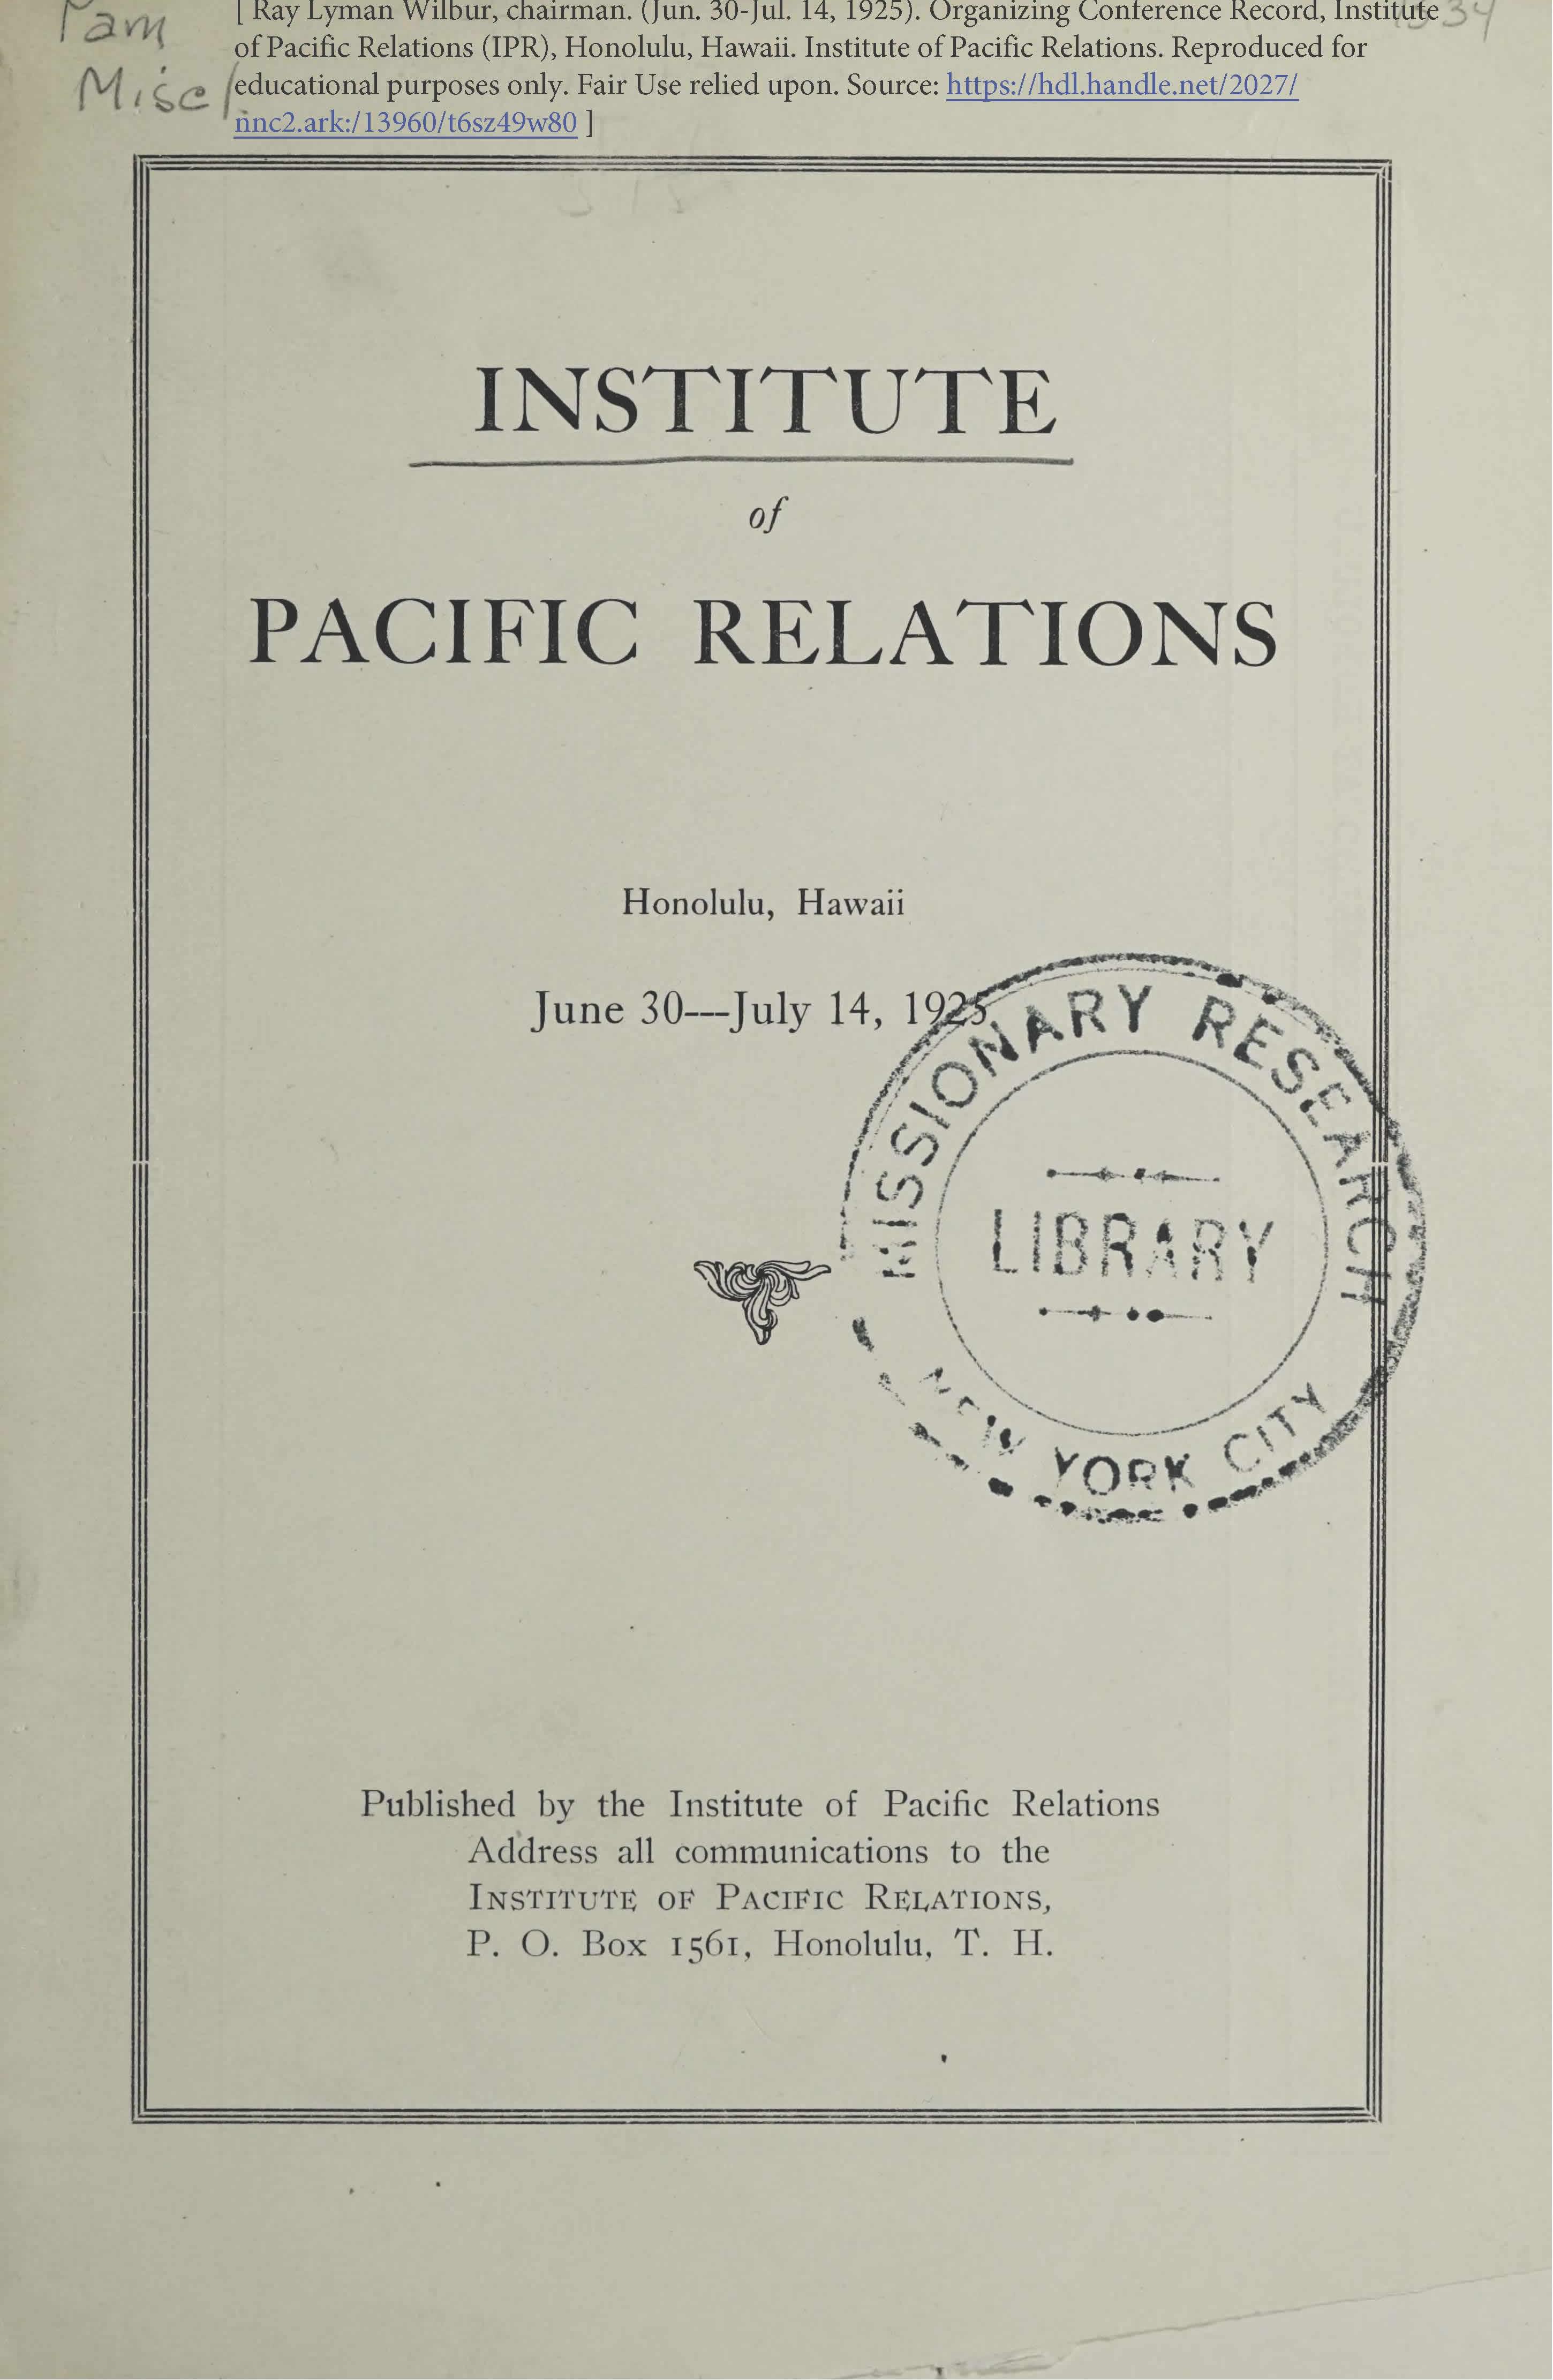 Ray Lyman Wilbur, chairman. (Jun. 30-Jul. 14, 1925). Organizing Conference Record, PROCEEDINGS, Institute of Pacific Relations, Honolulu, Hawaii. Institute of Pacific Relations.